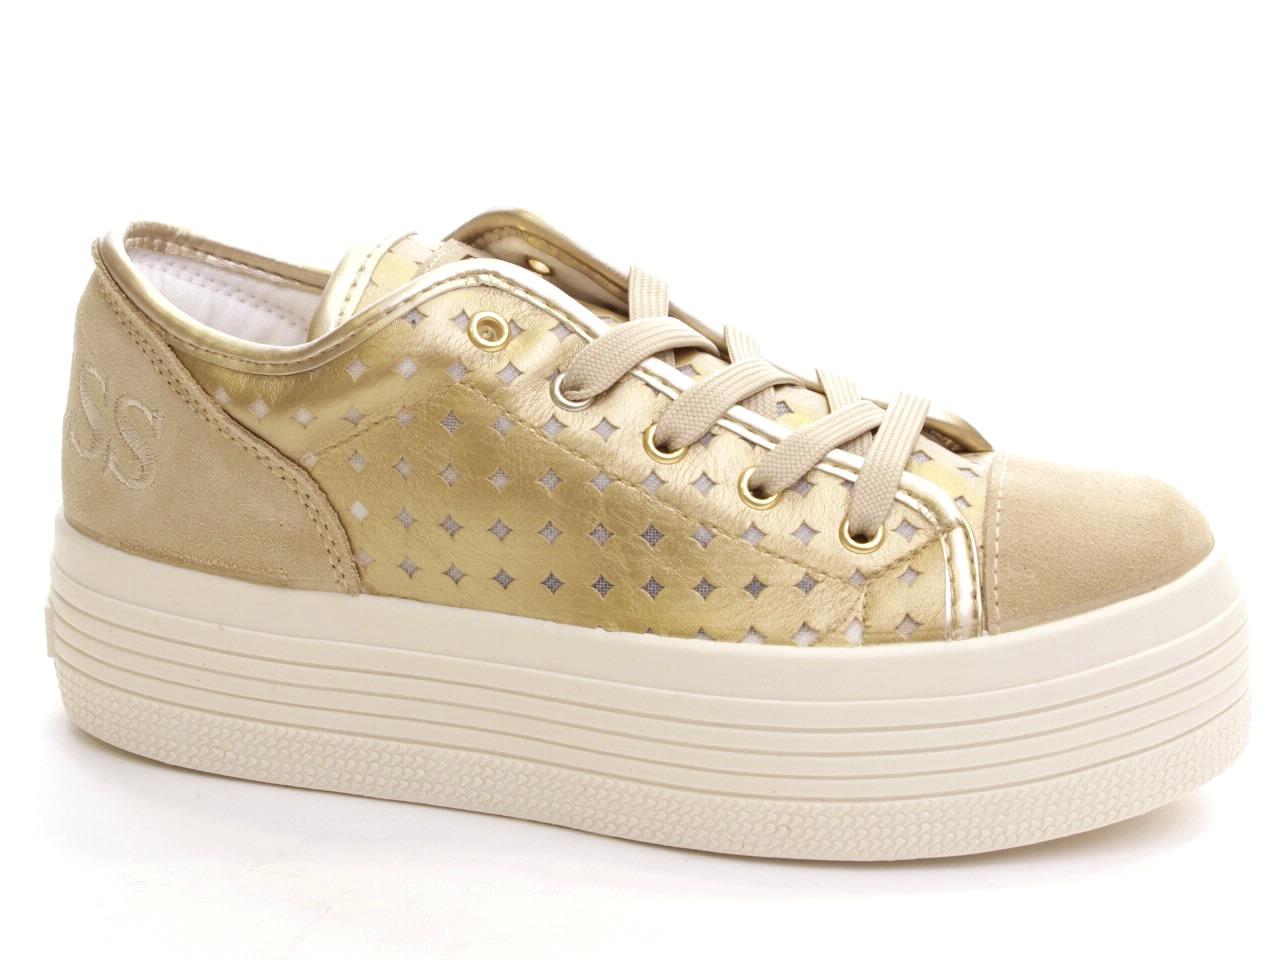 Sneakers and Espadrilles Guess - 465 FL1BRUELE12